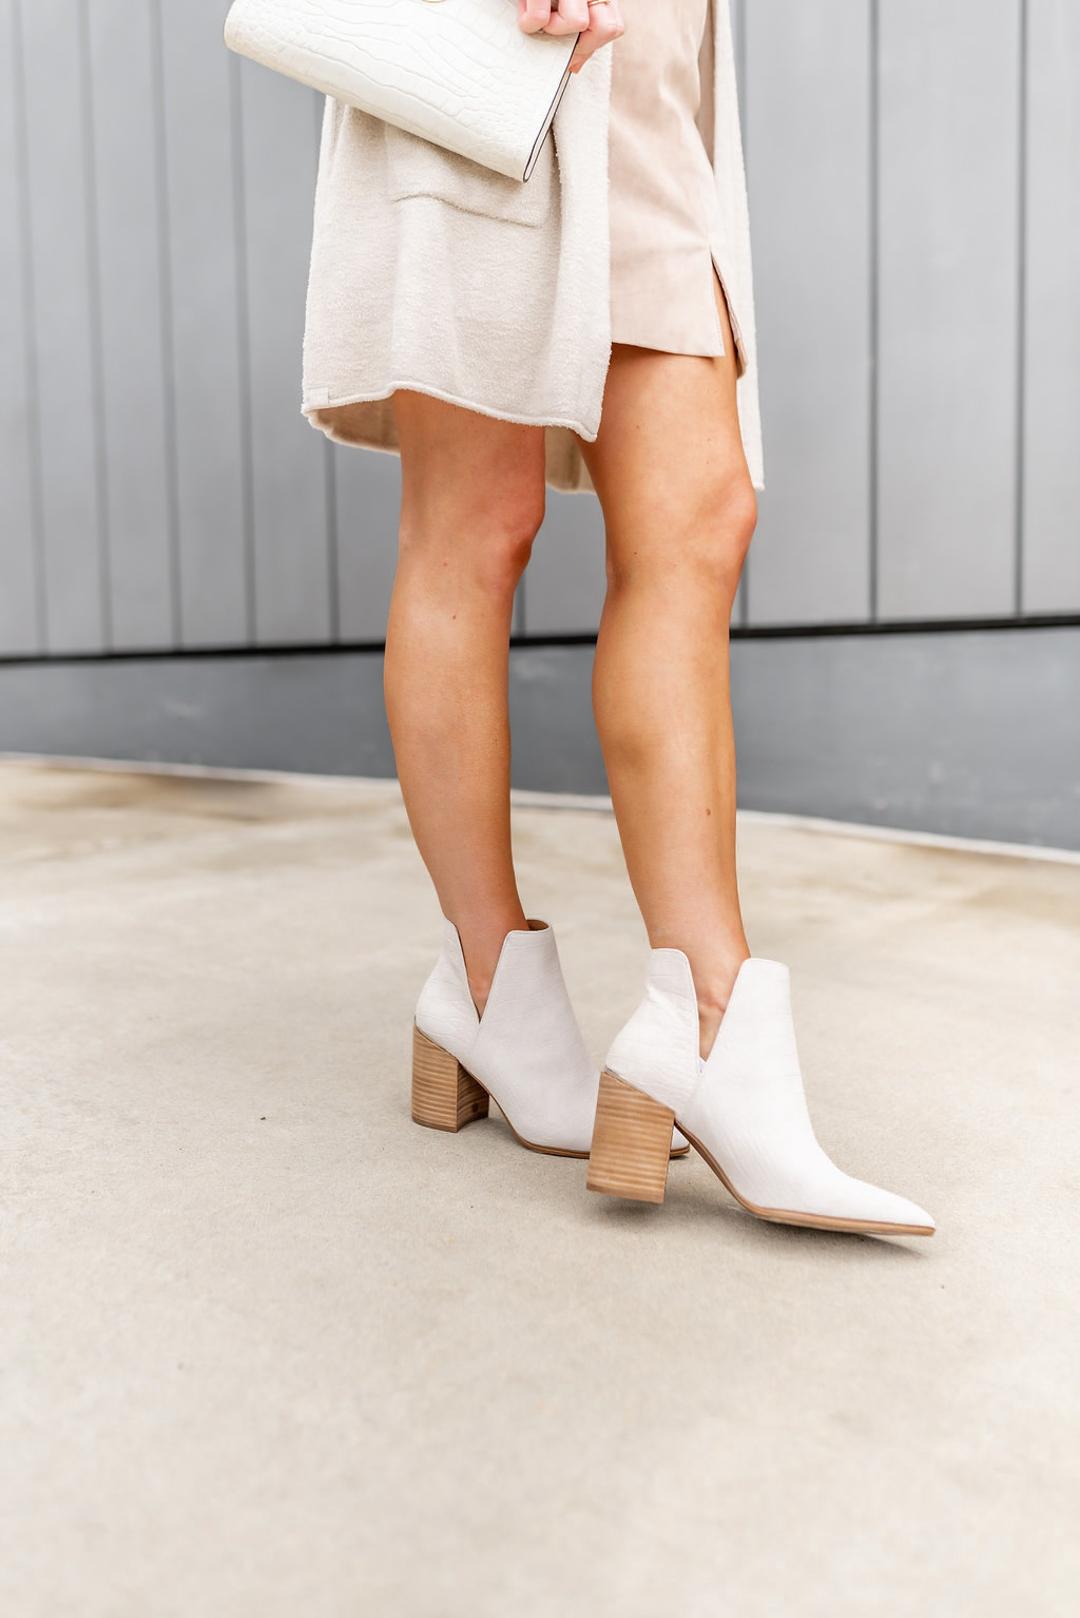 whitebooties